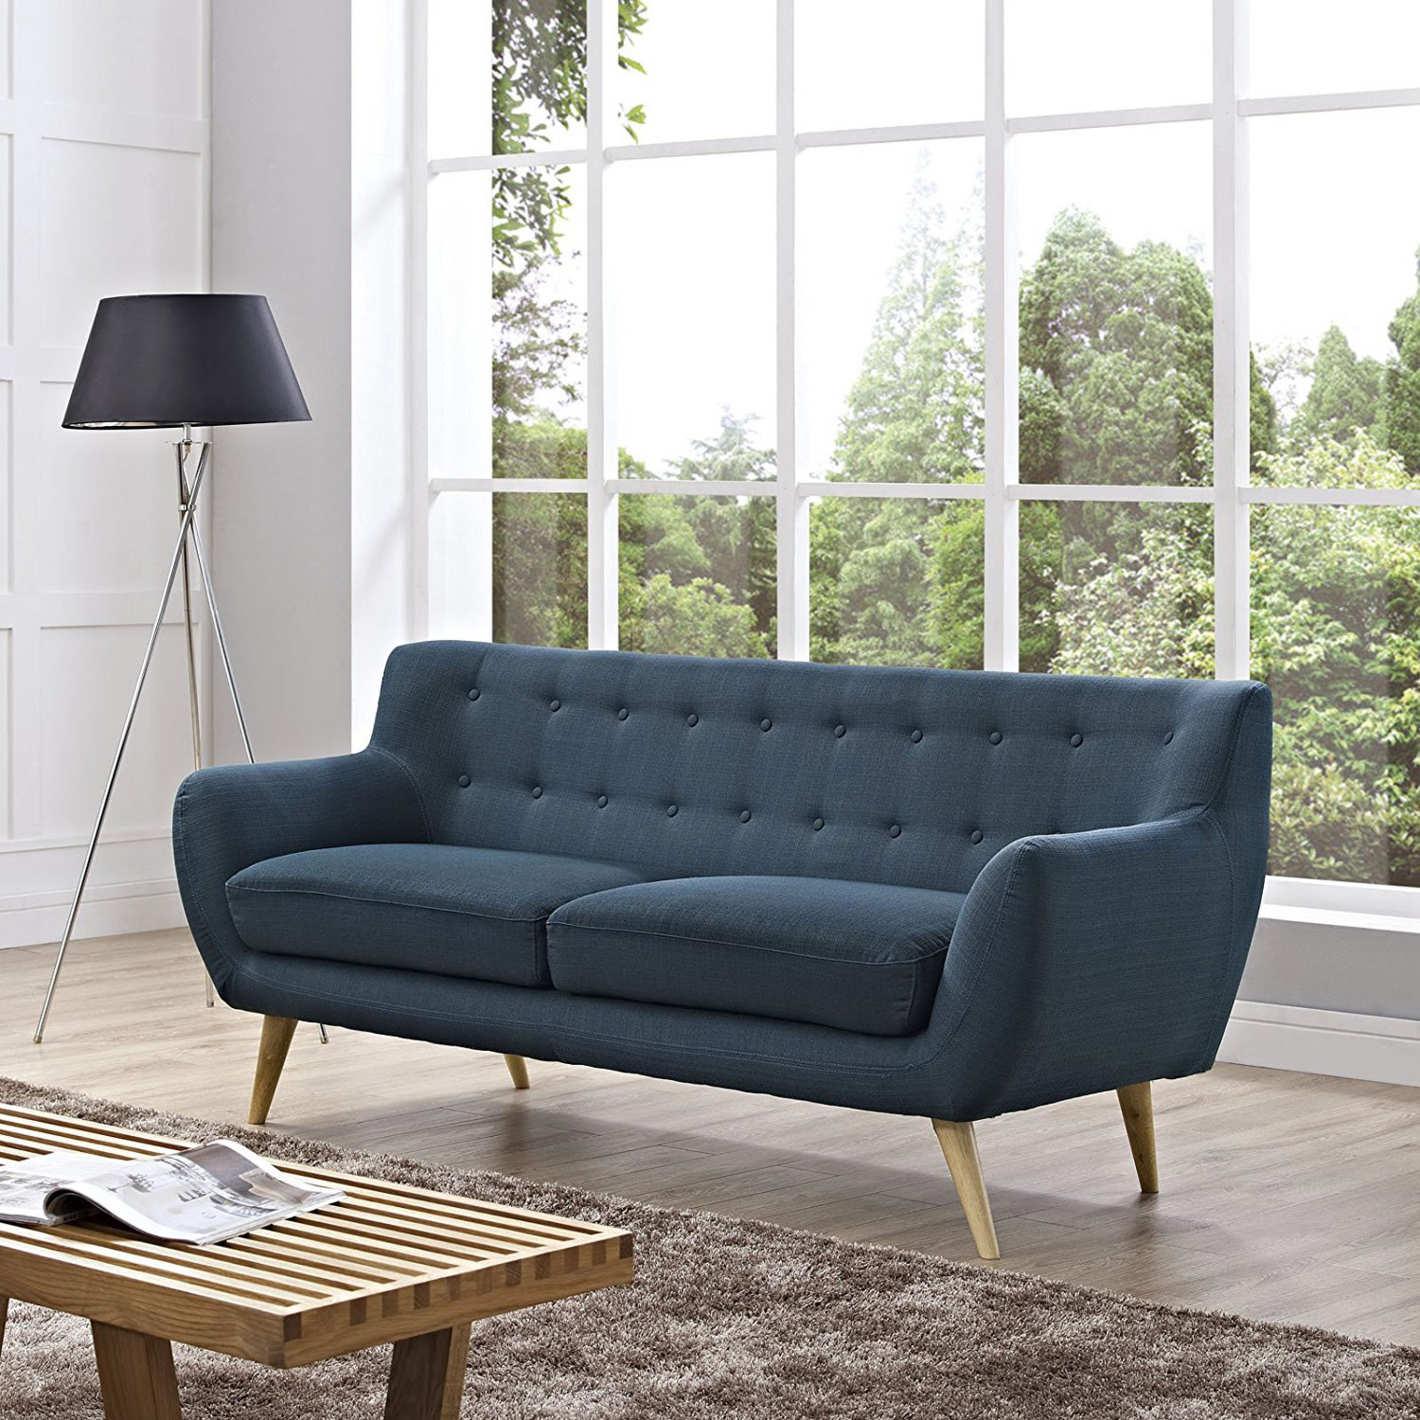 the best sofas under $500. modway remark DYKFTRS